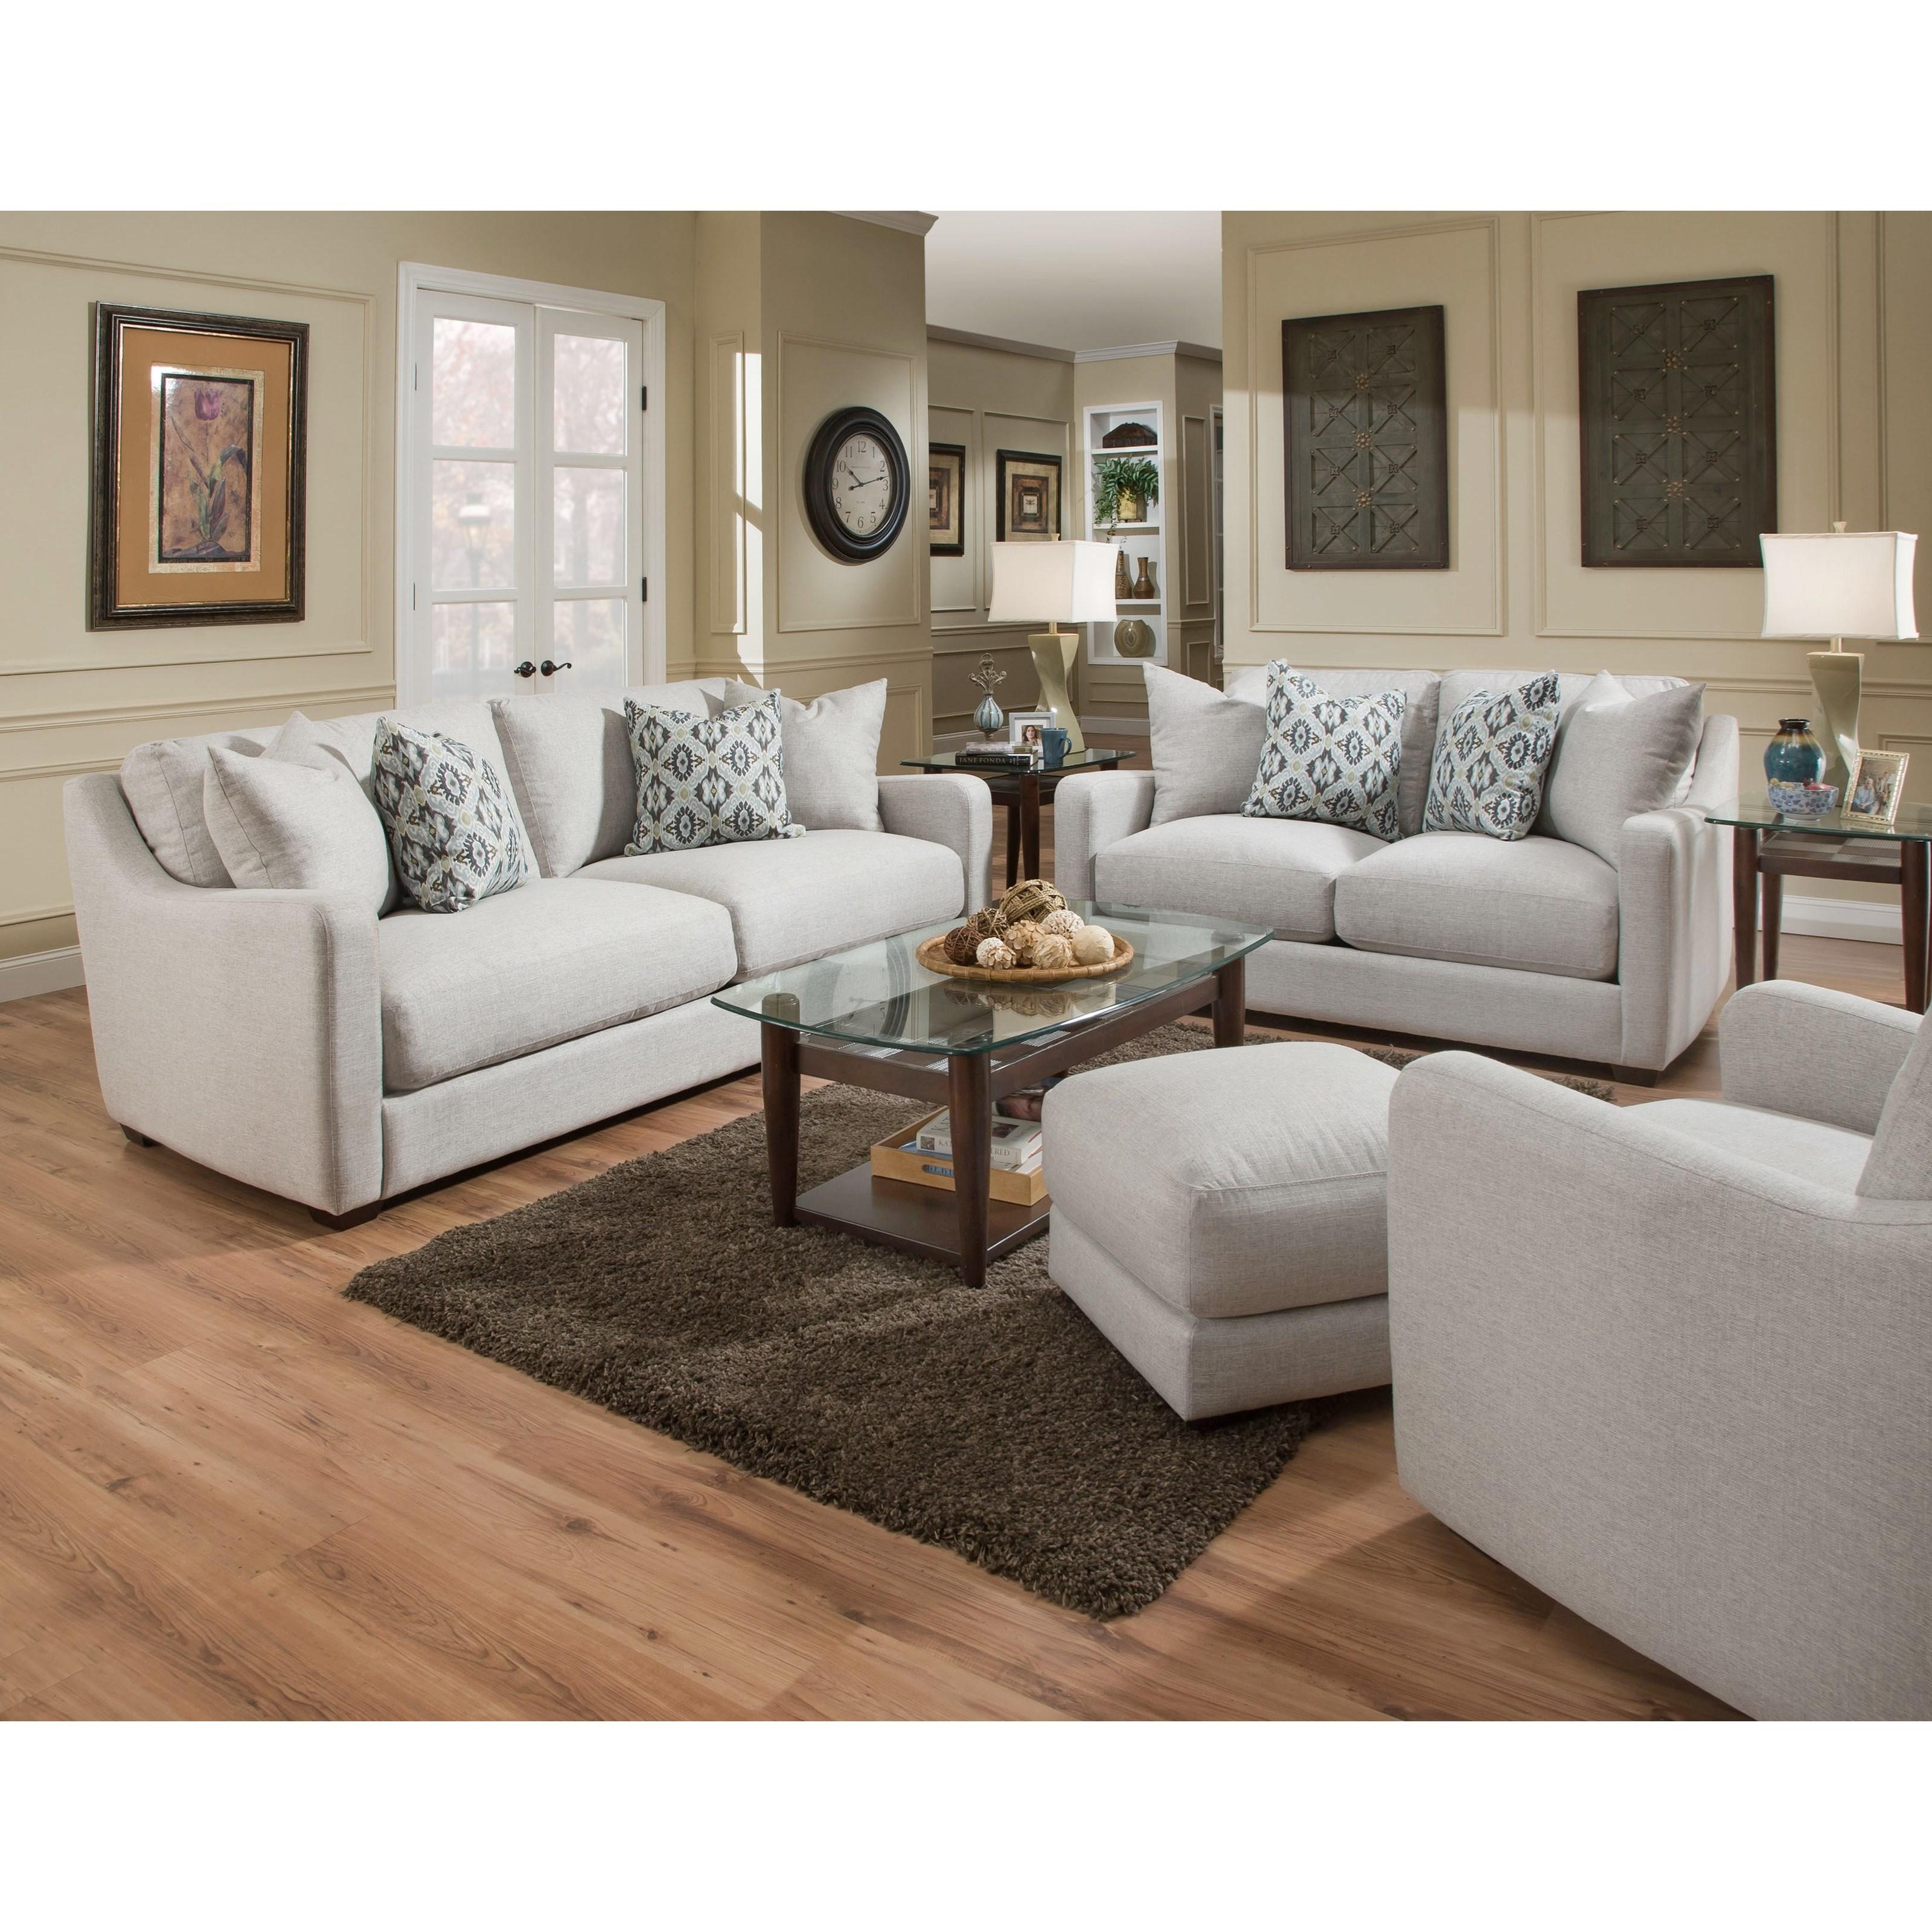 Franklin 885 88520 Loveseat John V Schultz Furniture Love Seats